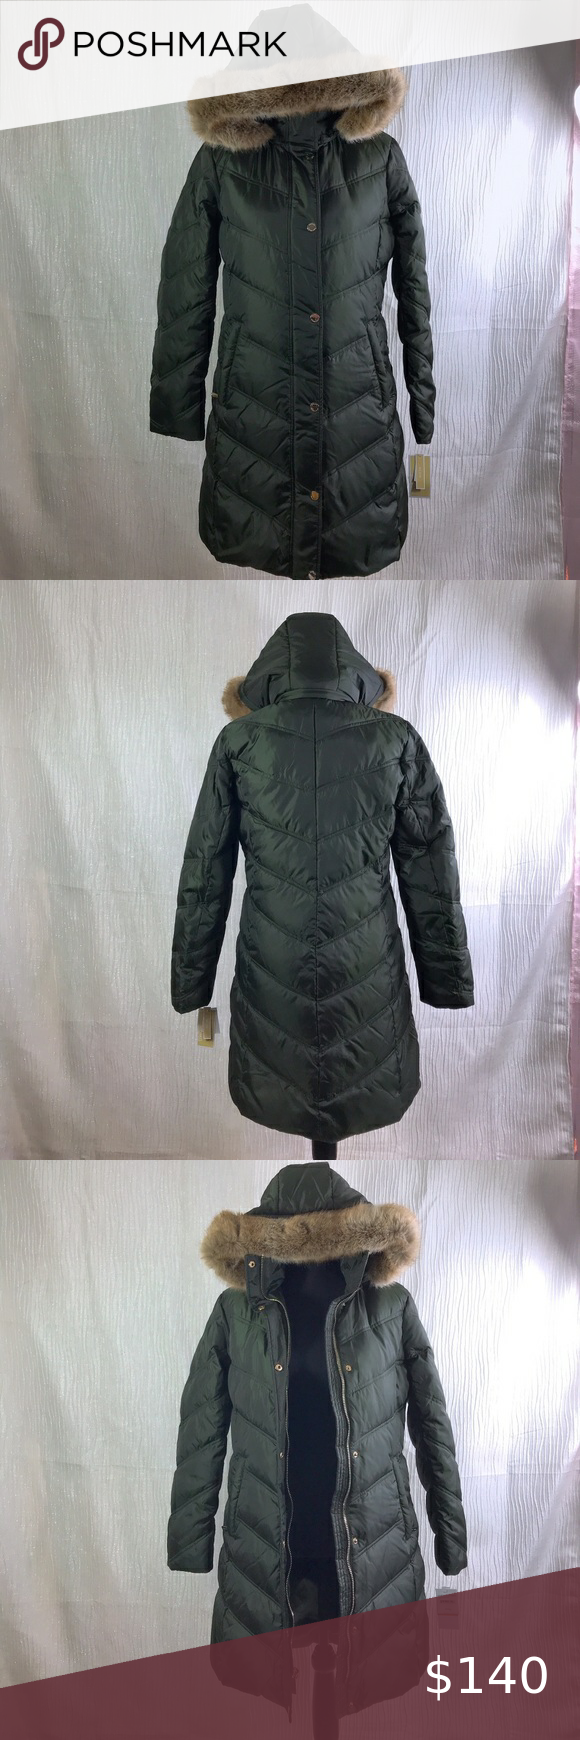 Michael Kors Missy 3 4 Down Faux Fur Trim Jacket Trim Jacket Michael Kors Michael Kors Jackets [ 1740 x 580 Pixel ]